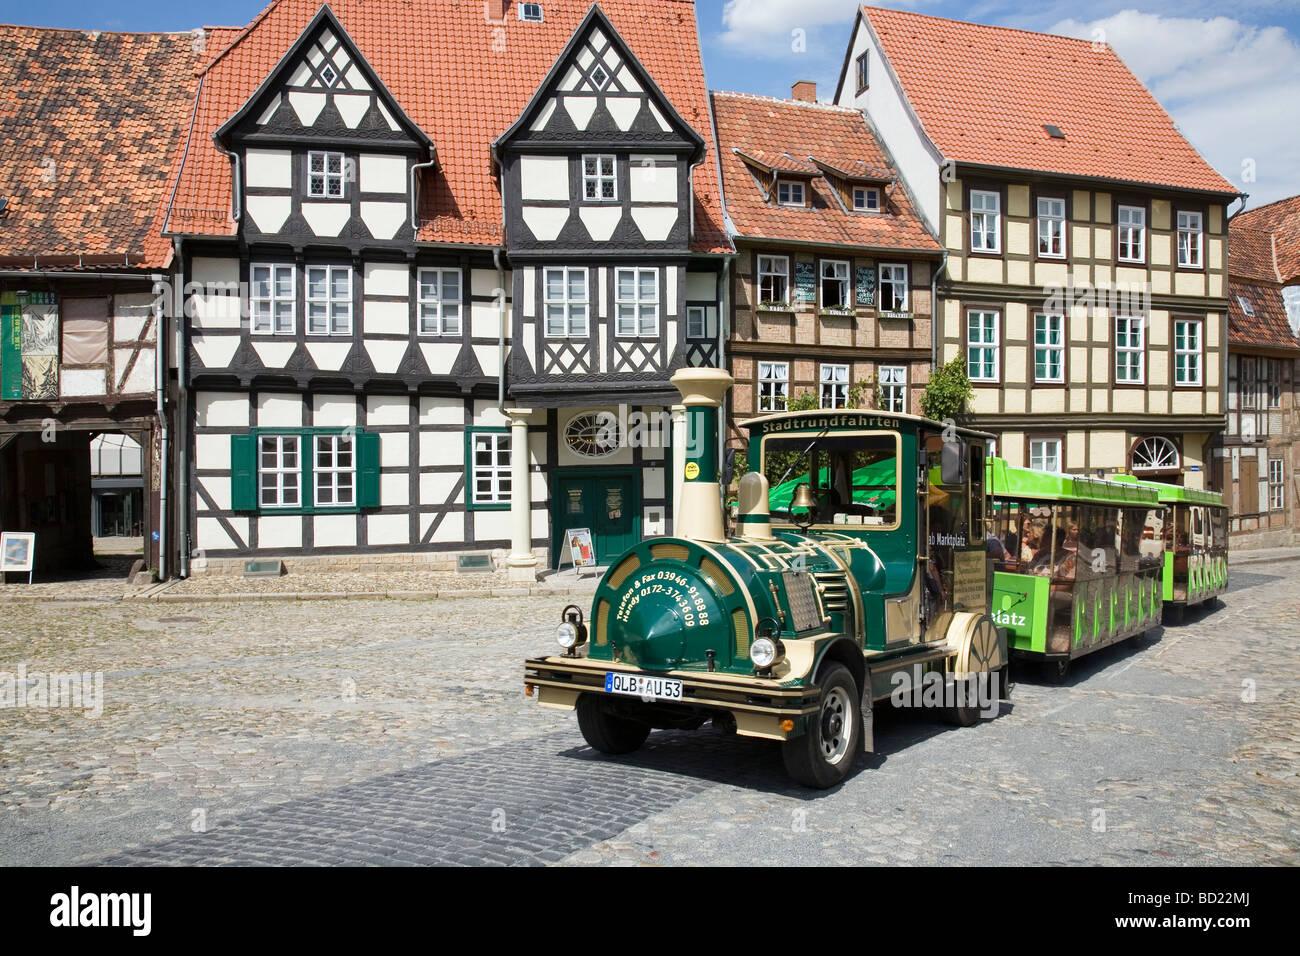 Schlossberg, Quedlinburg, Saxony Anhalt, Germany with tourist train - Stock Image